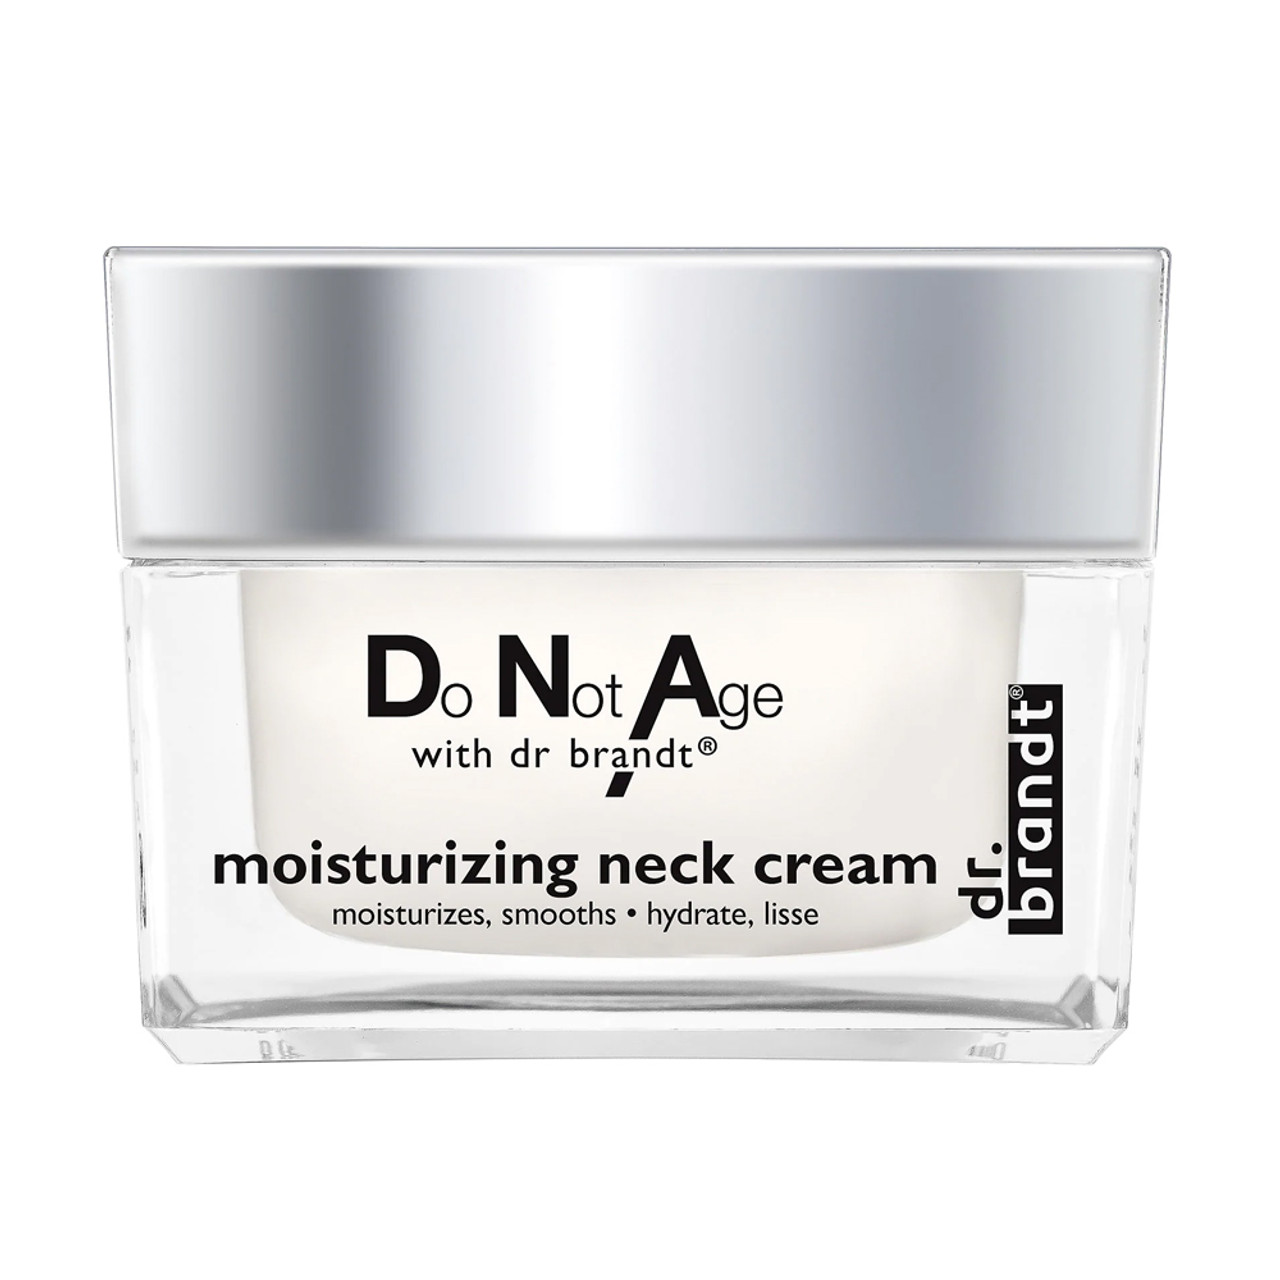 Dr. Brandt Do Not Age Moisturizing Neck Cream